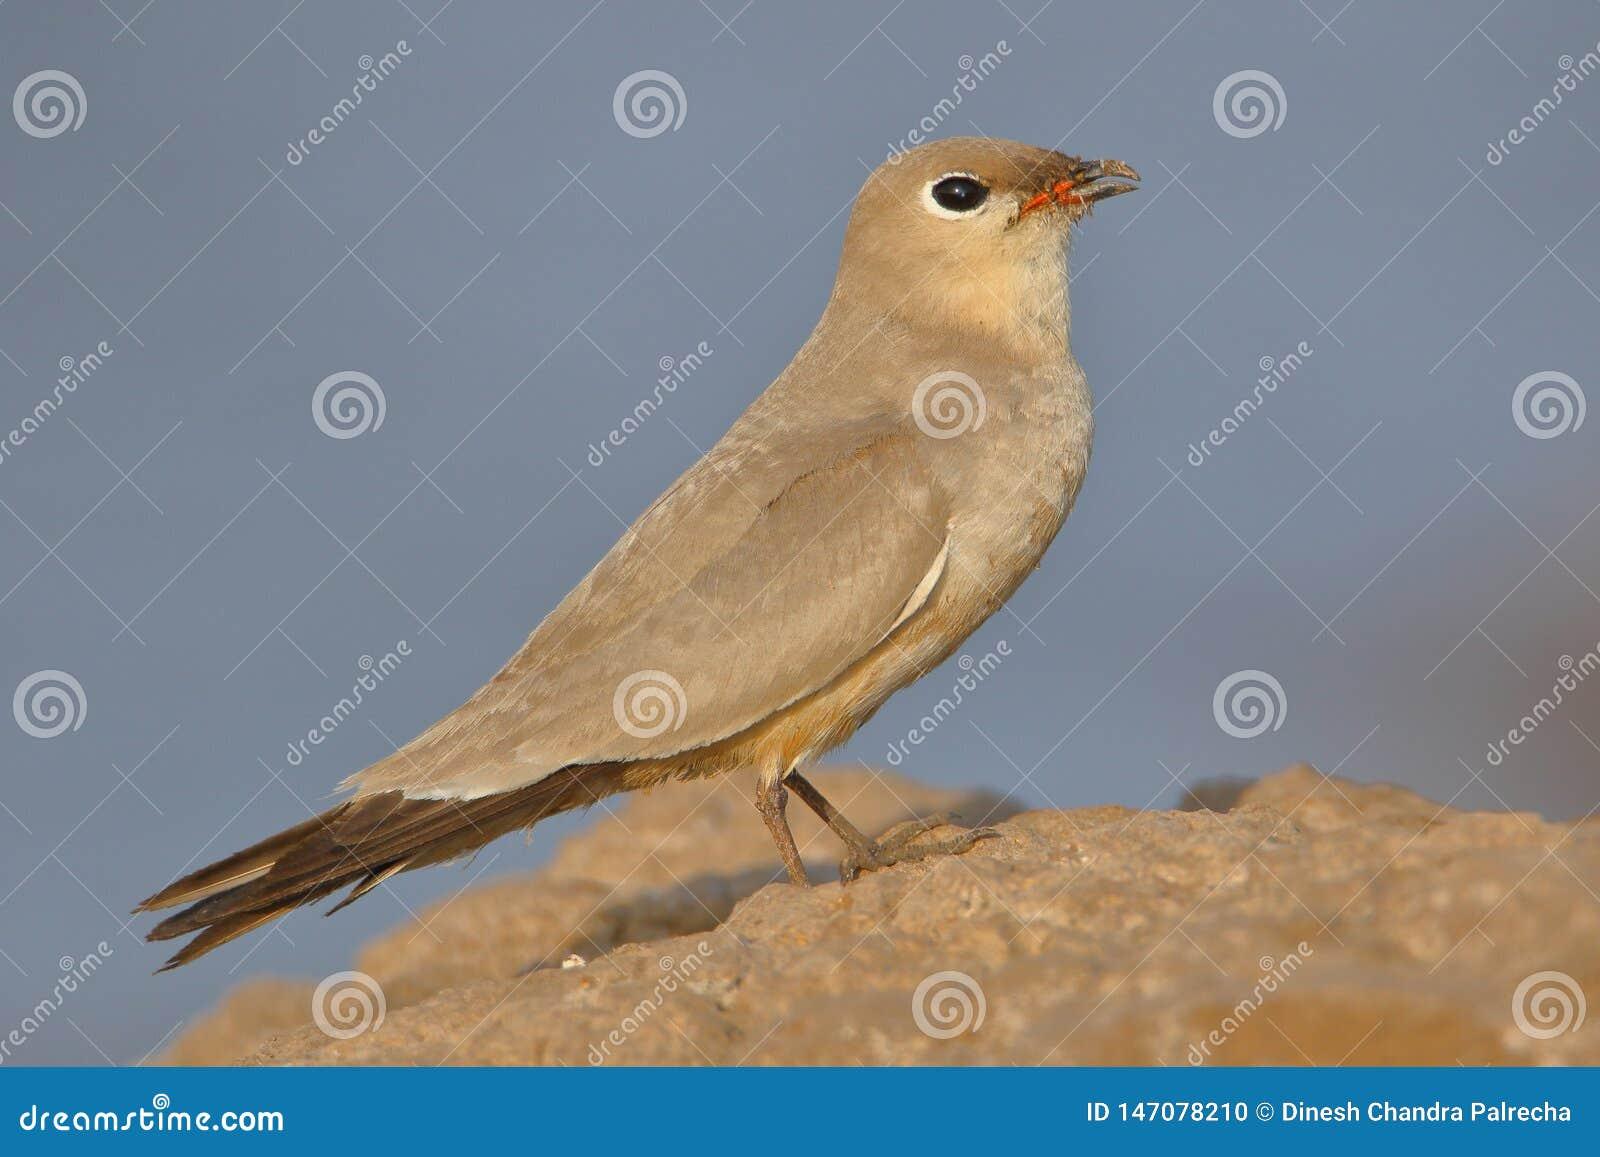 Small pratincole bird.